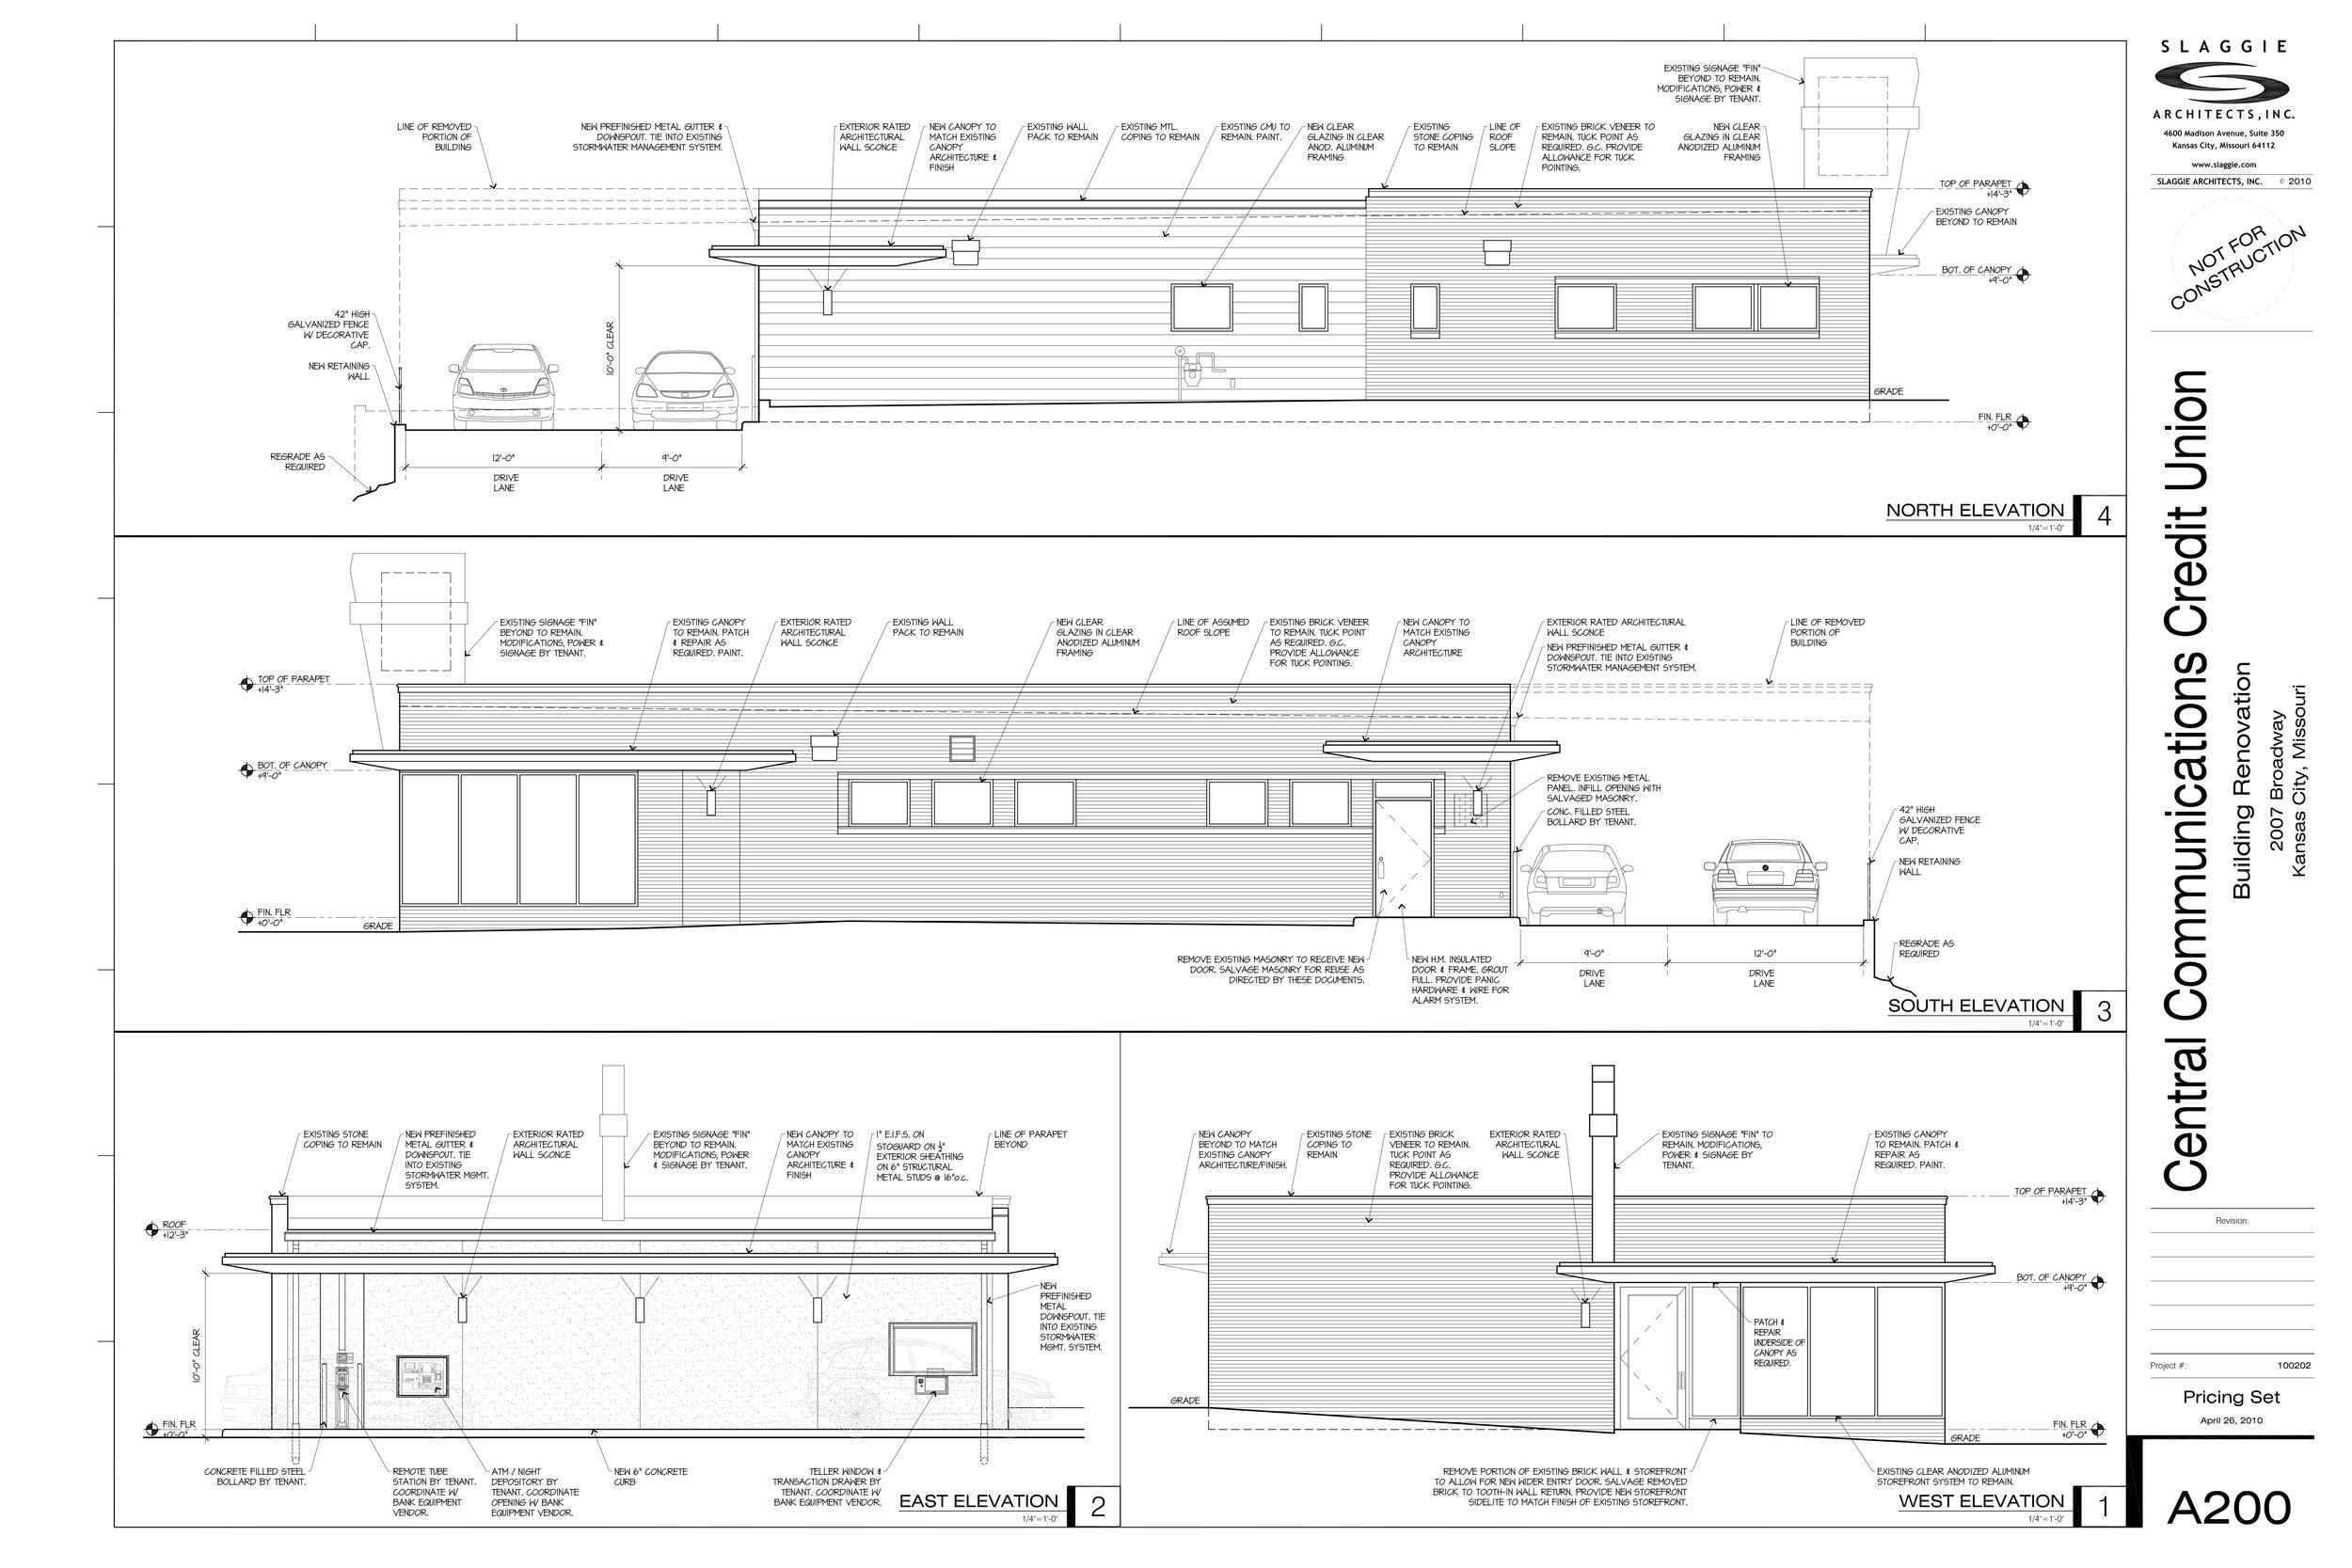 2007 Broadway -  Elevation plan